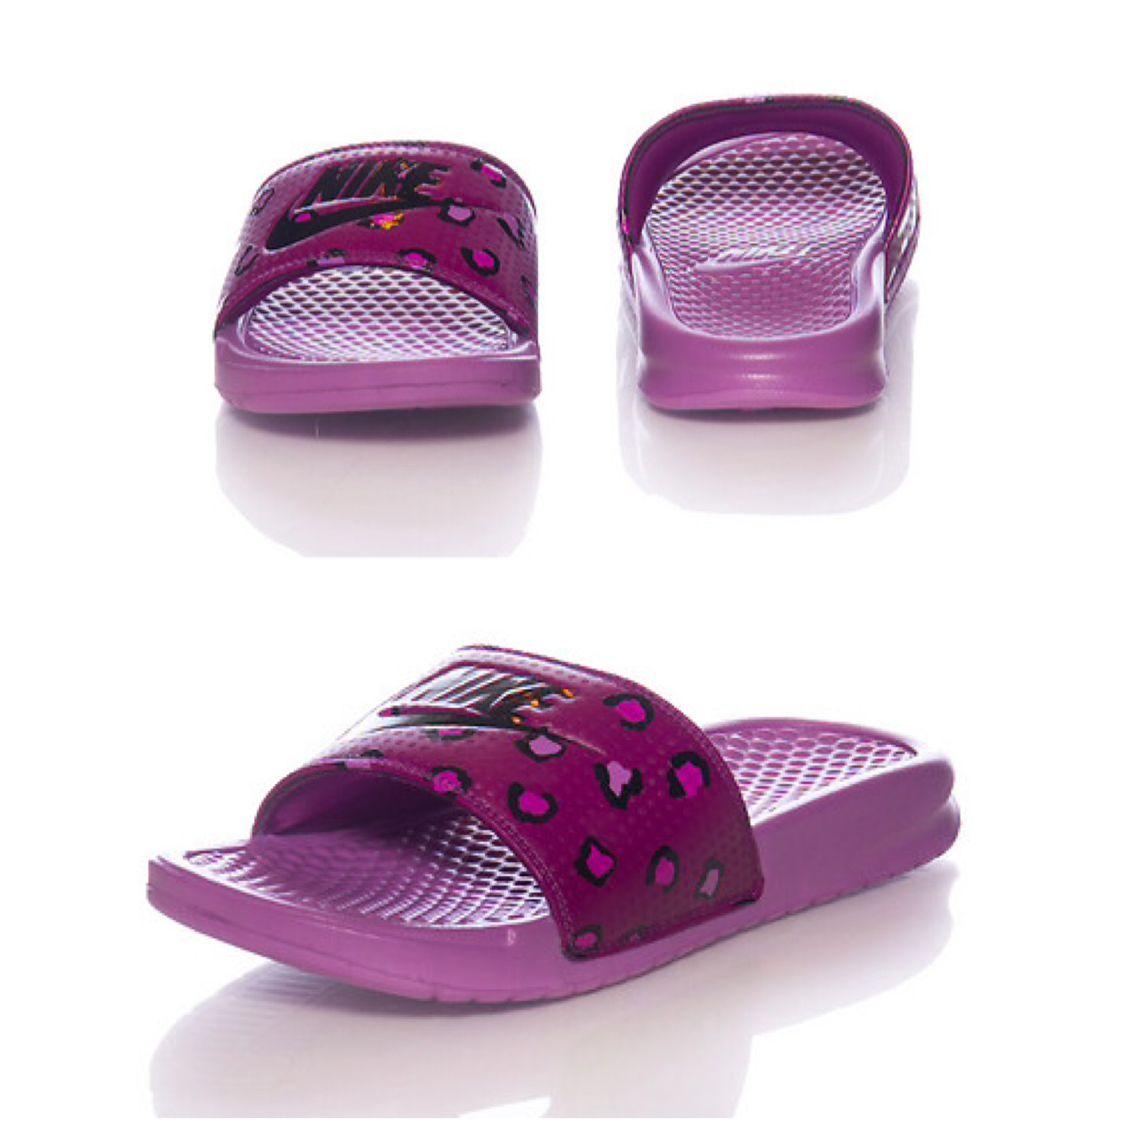 Nike slides, Nike sandals, Cheetah nikes